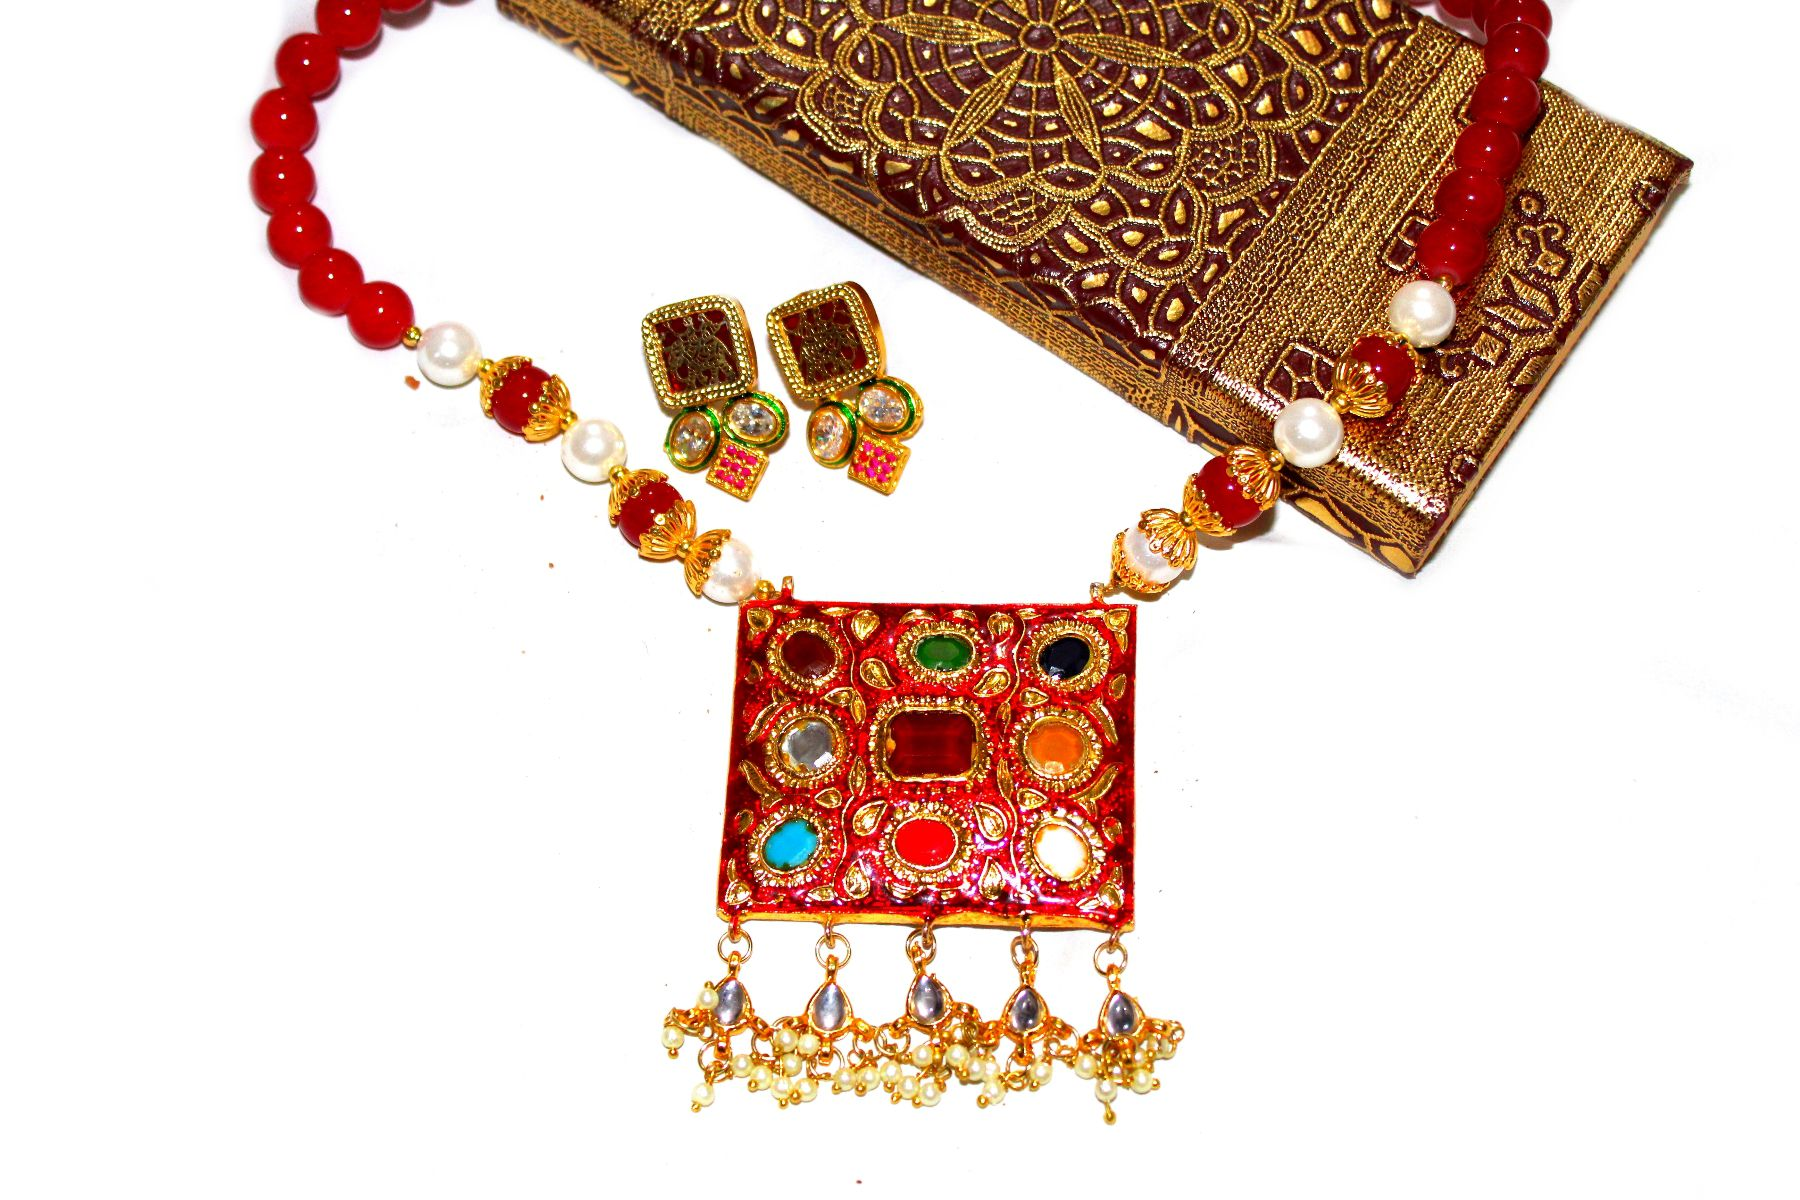 Designer Meenakari Dual Sided Padmavati Necklace and Earrings set by